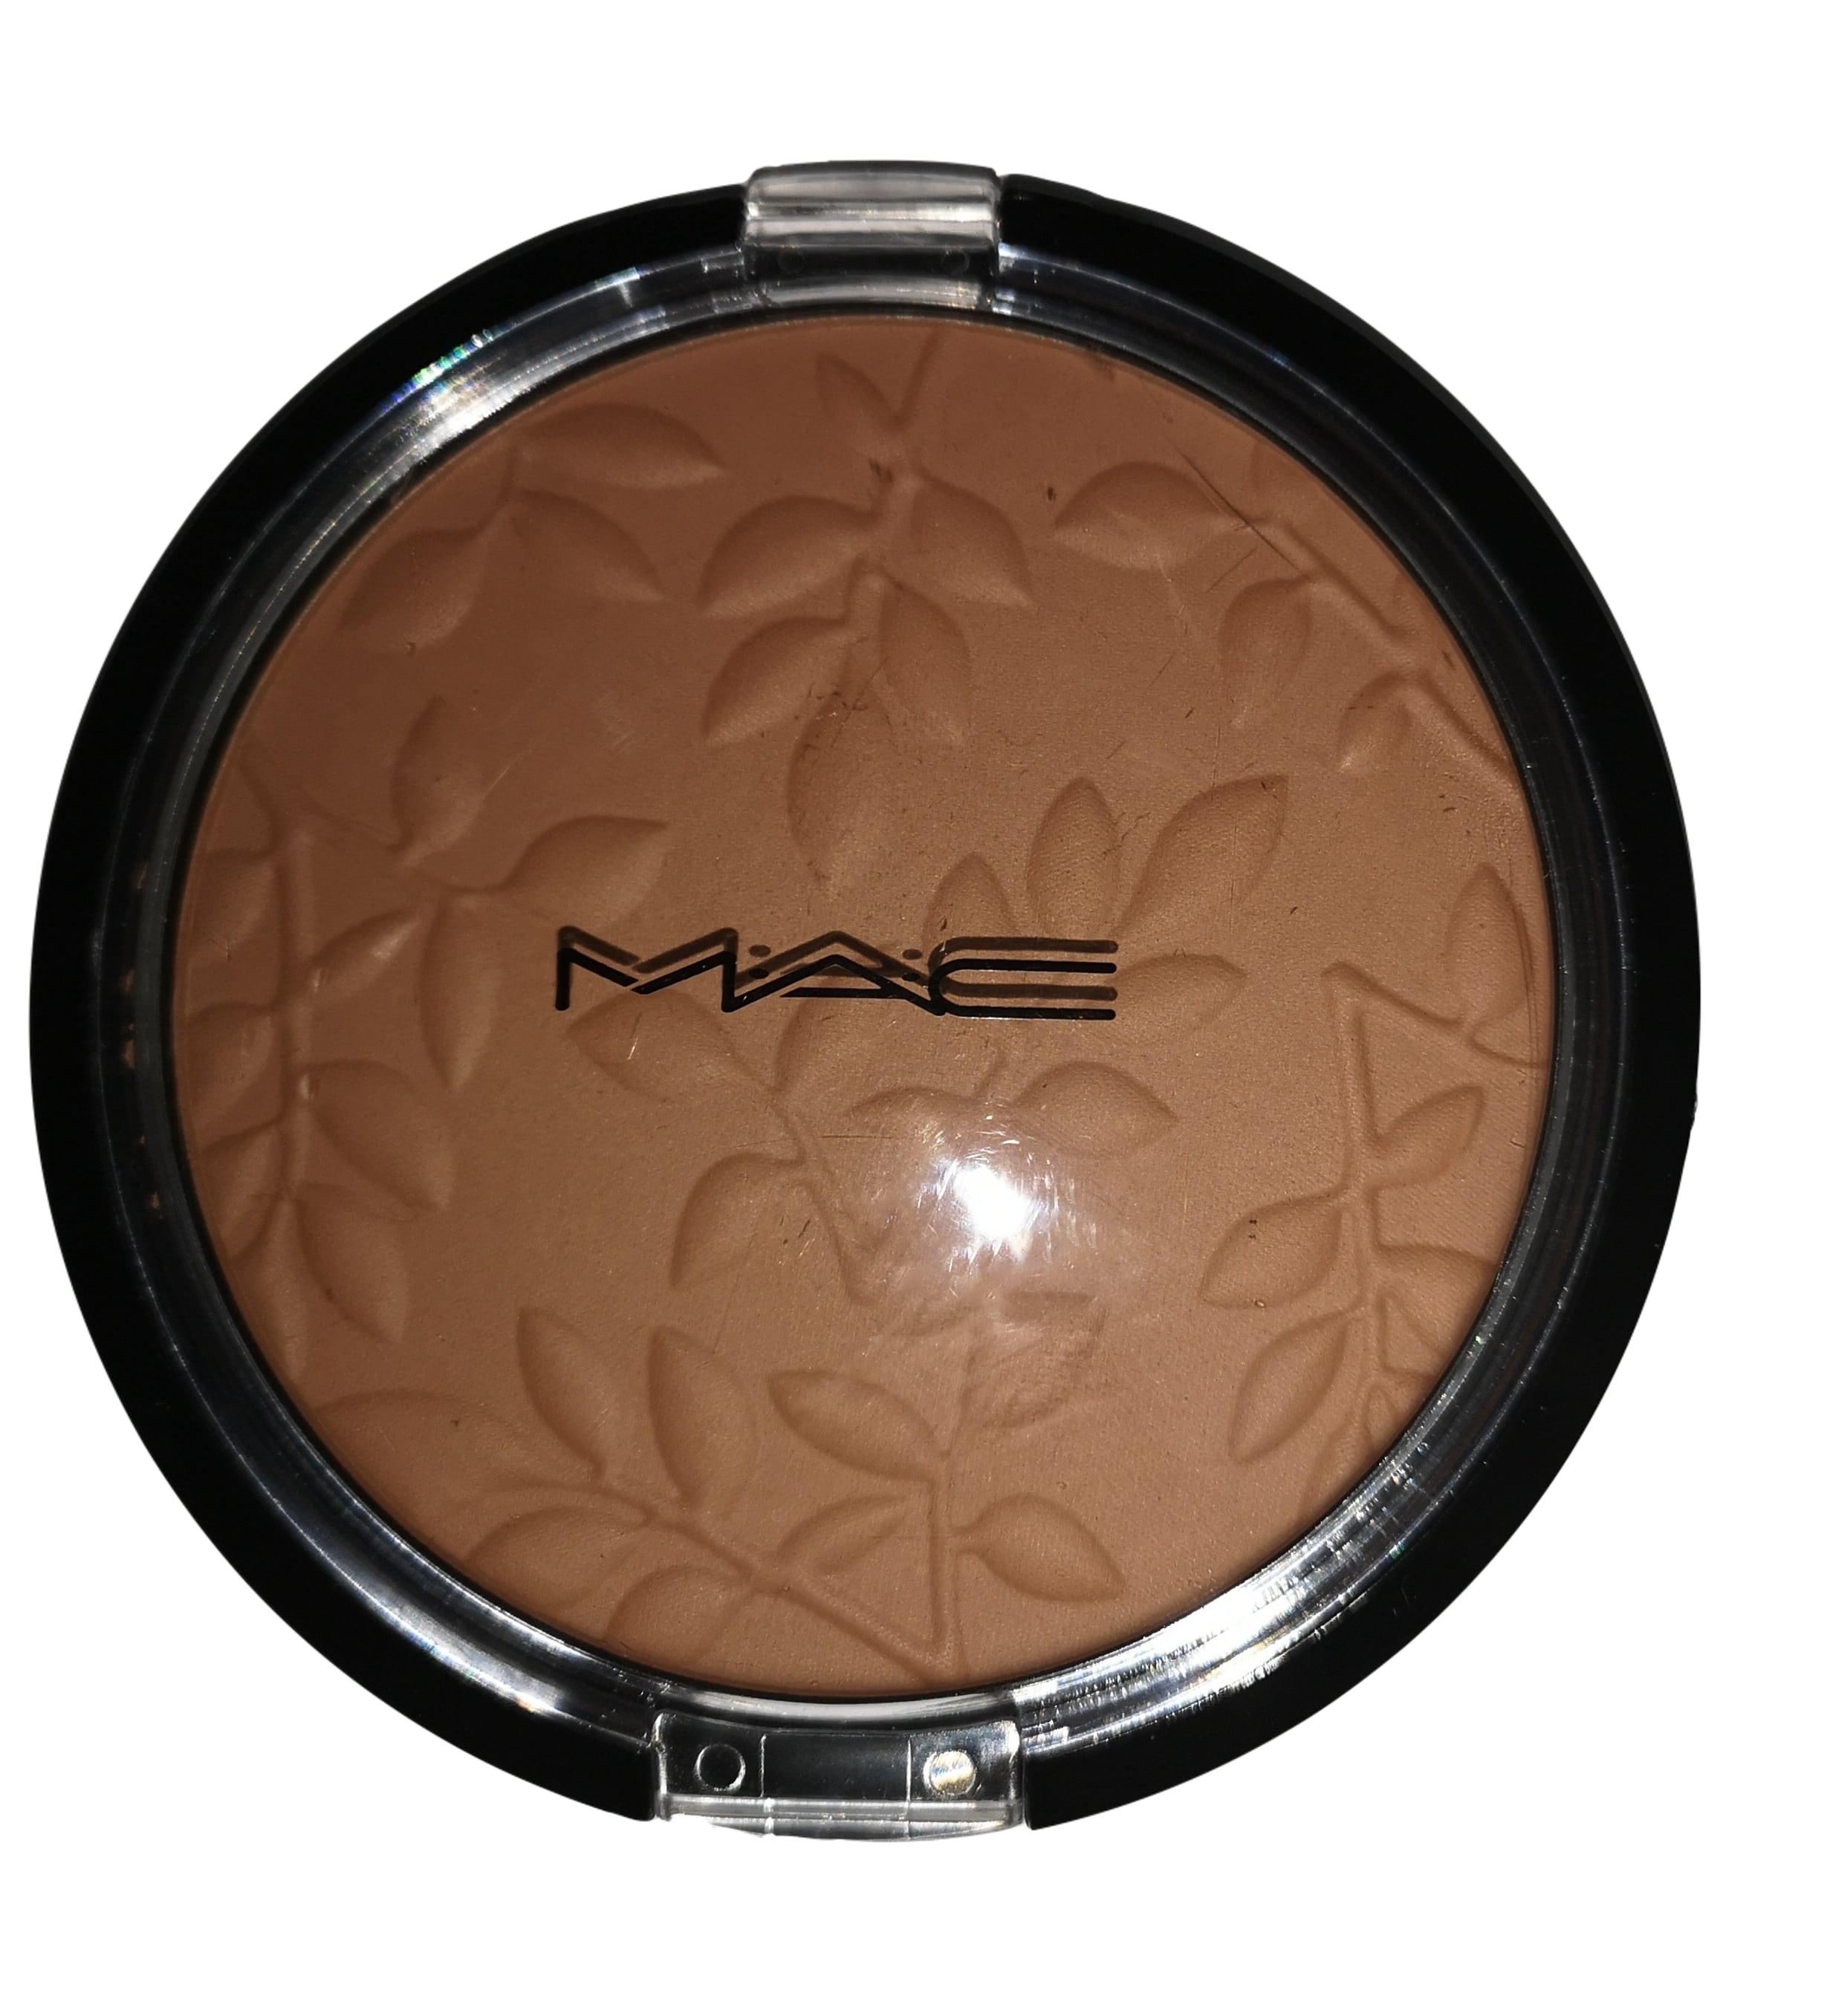 MAC MAXI  Bronzing Powder LIGHT N.631 NET 35G